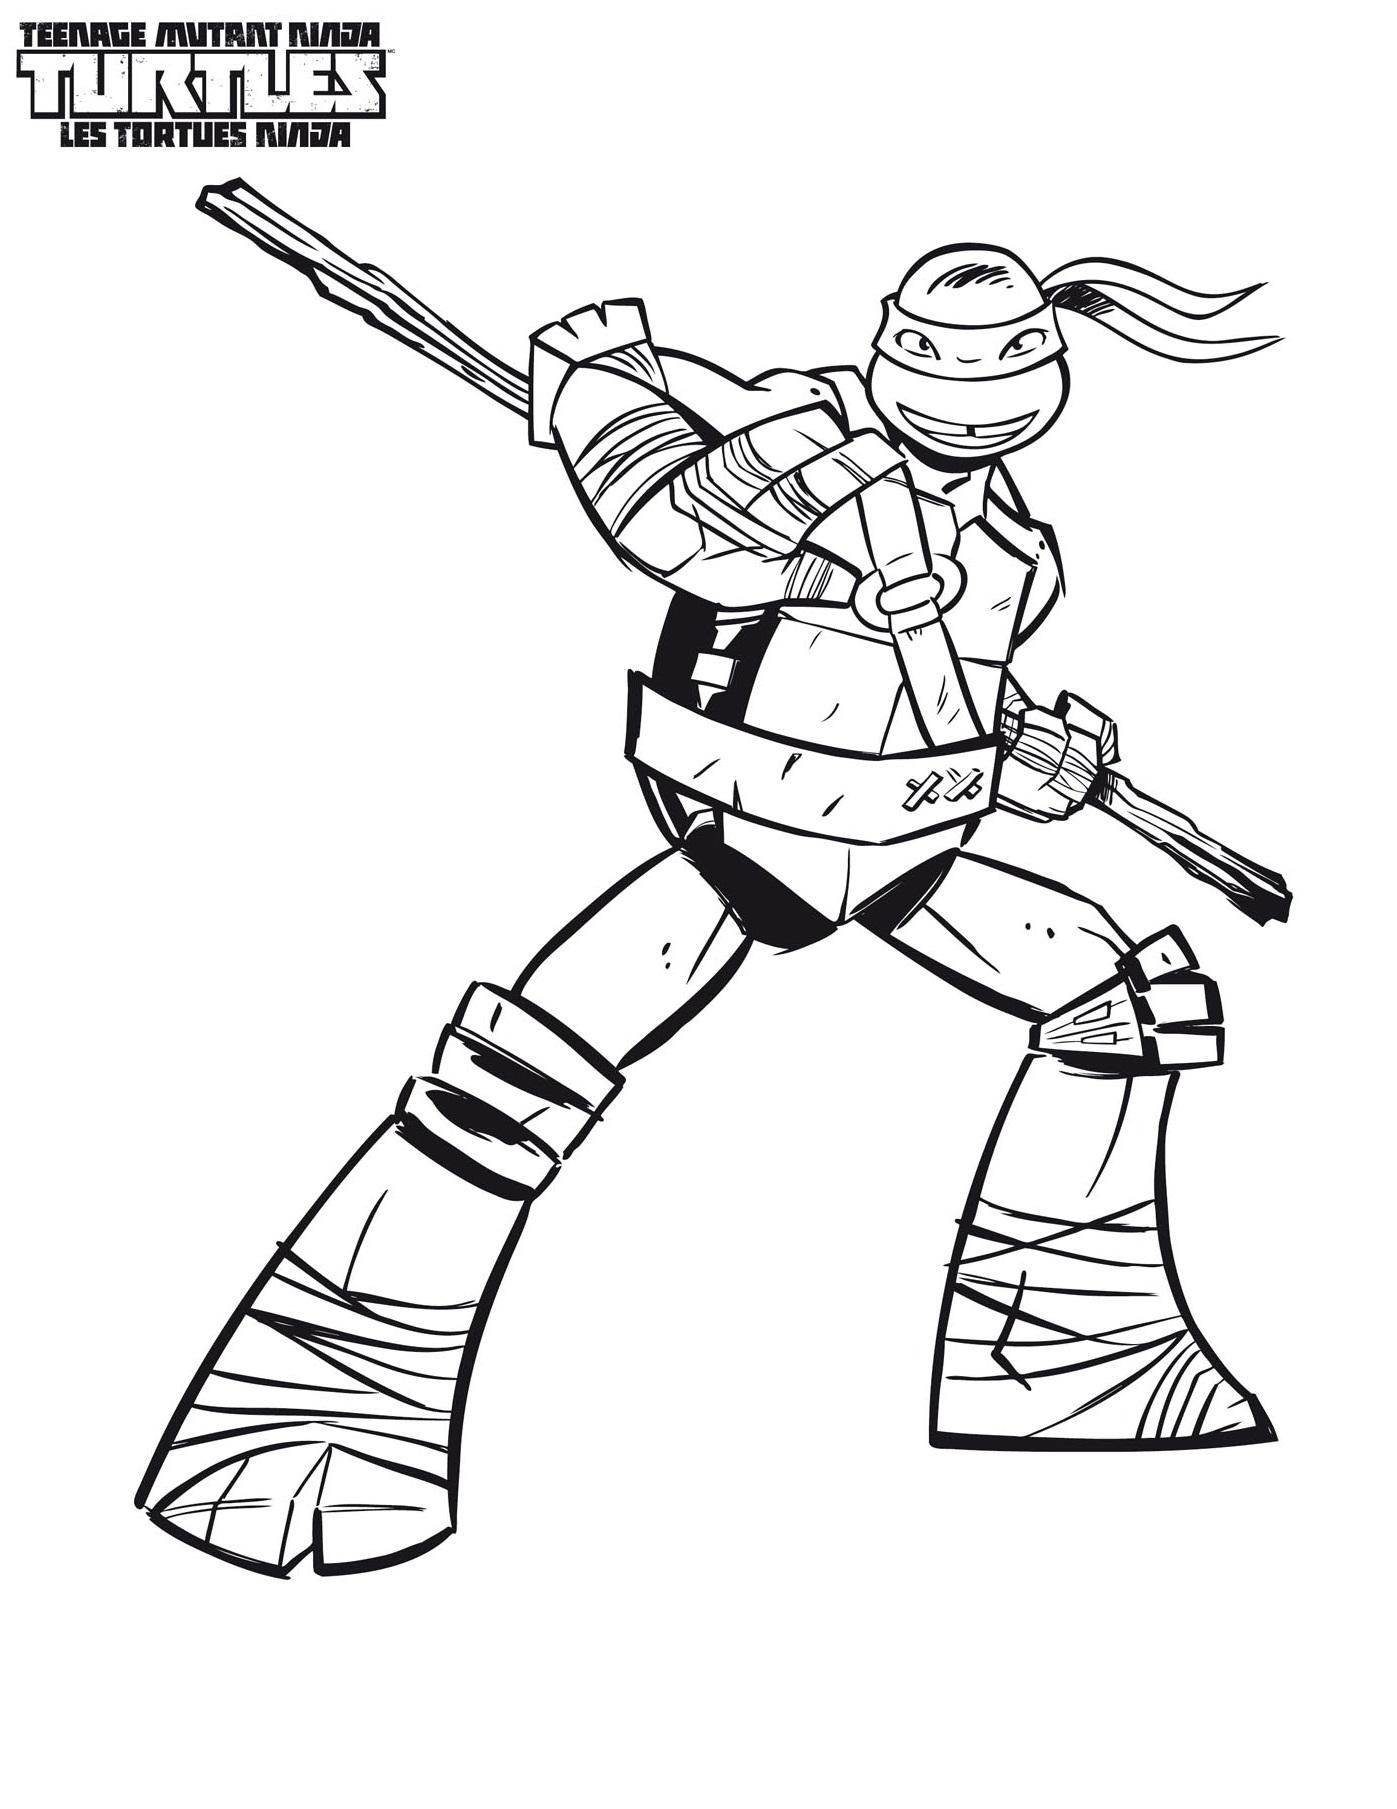 Dessin À Colorier Tortue Ninja Tfou dedans Coloriage Tortue Ninja Michelangelo